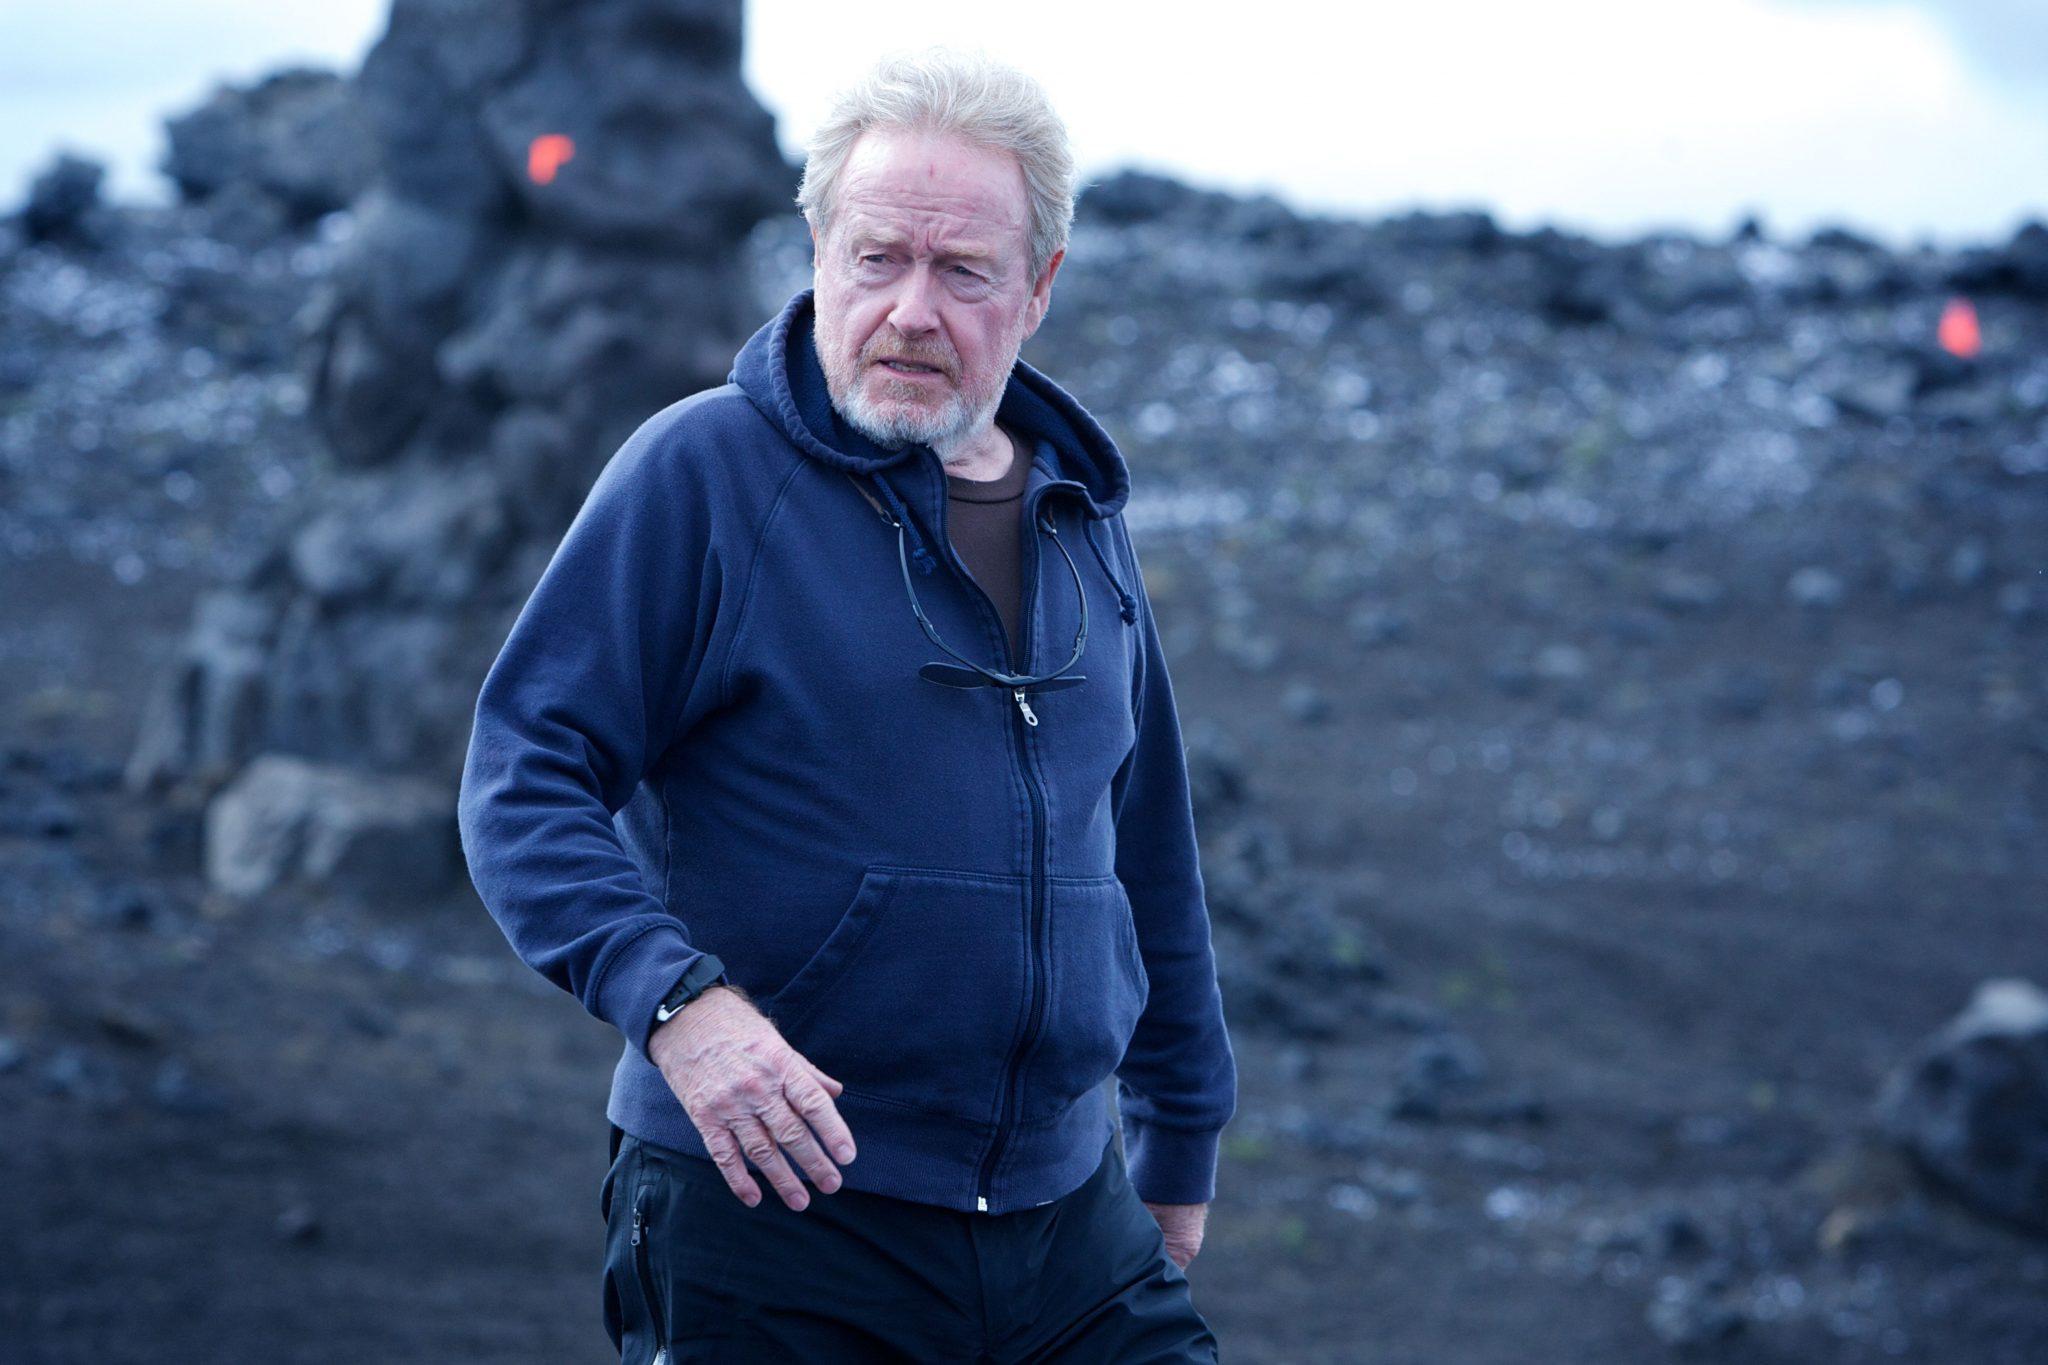 Ridley Scott won't direct the Blade Runner sequel